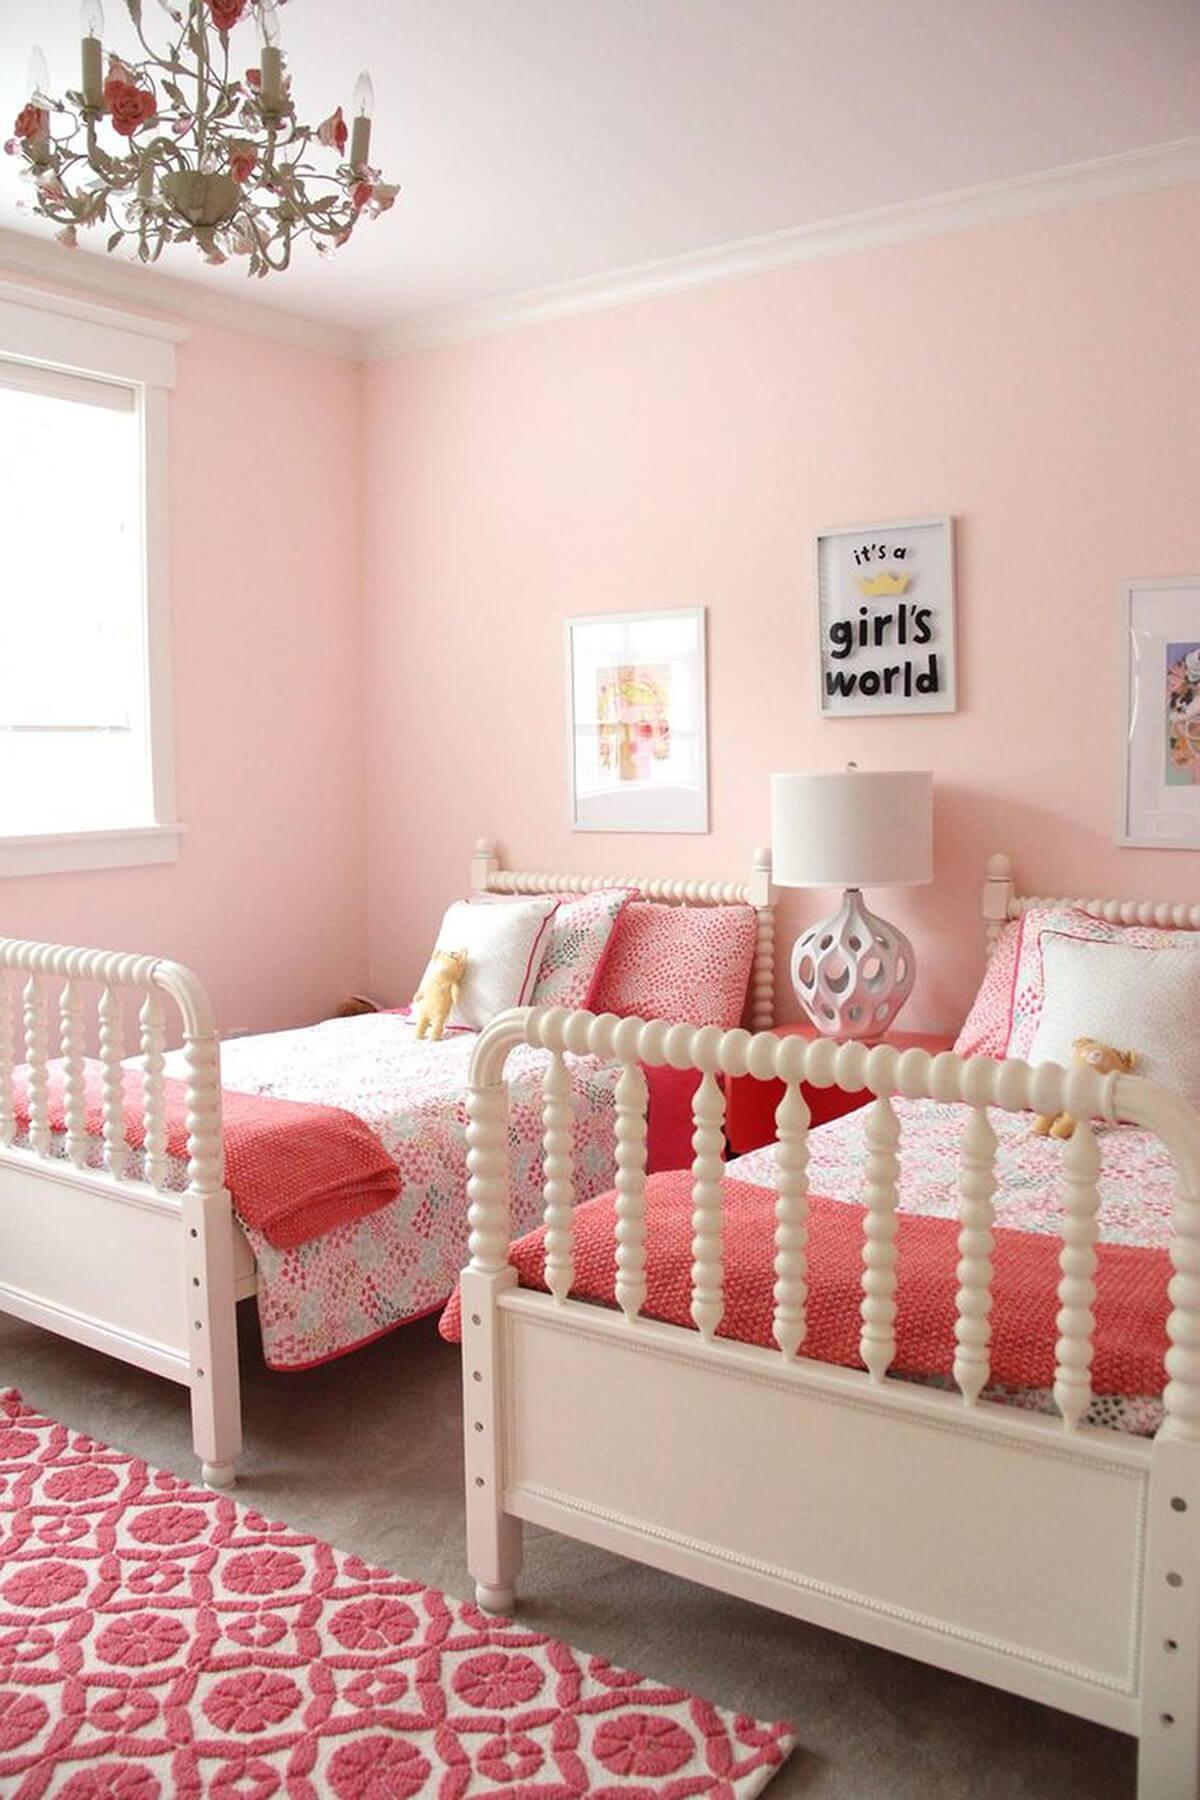 Fun Girl's World All in Pink